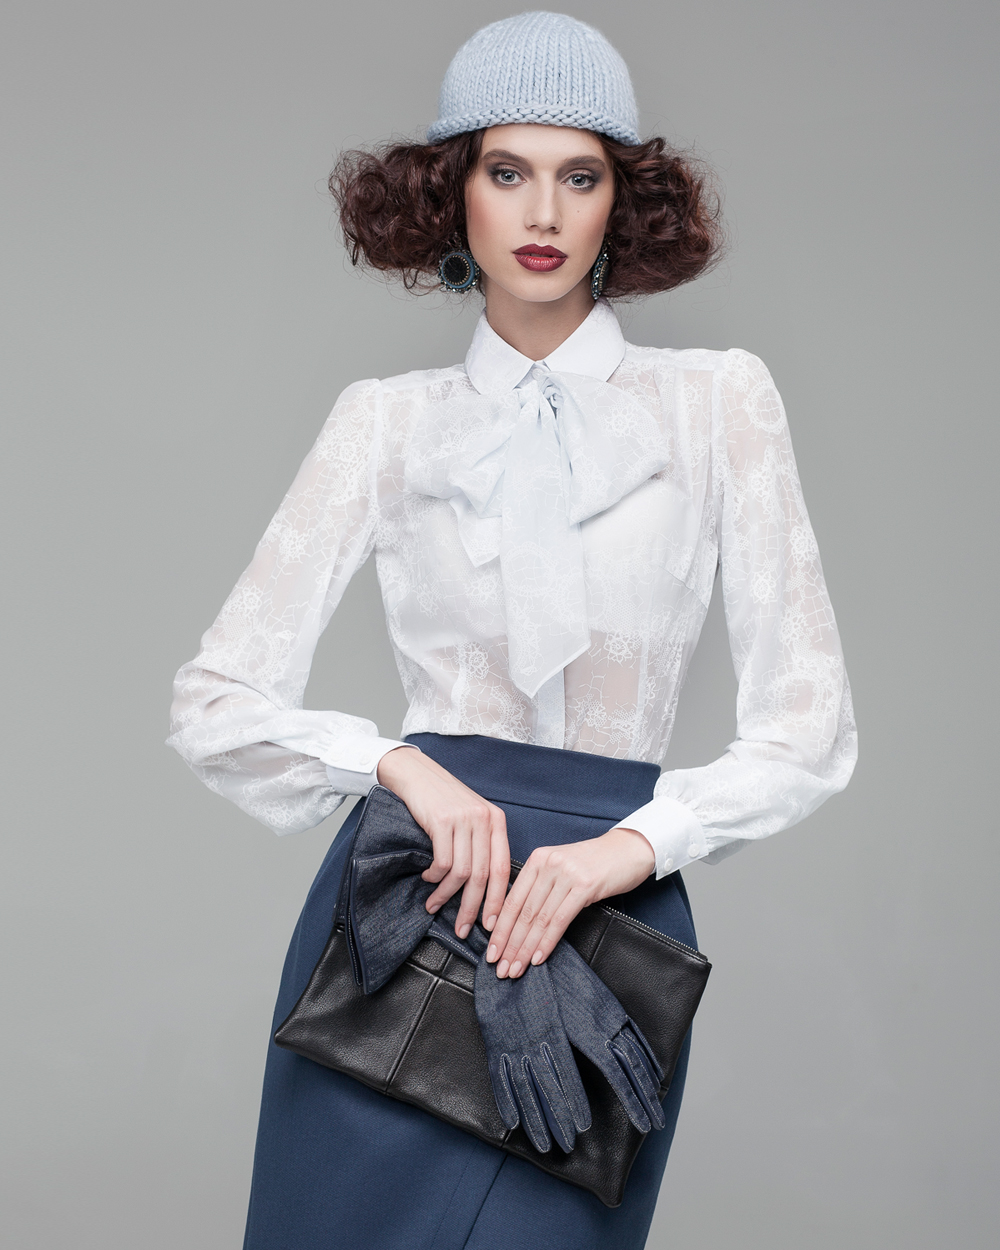 Блузка С Бантом Фото В Спб